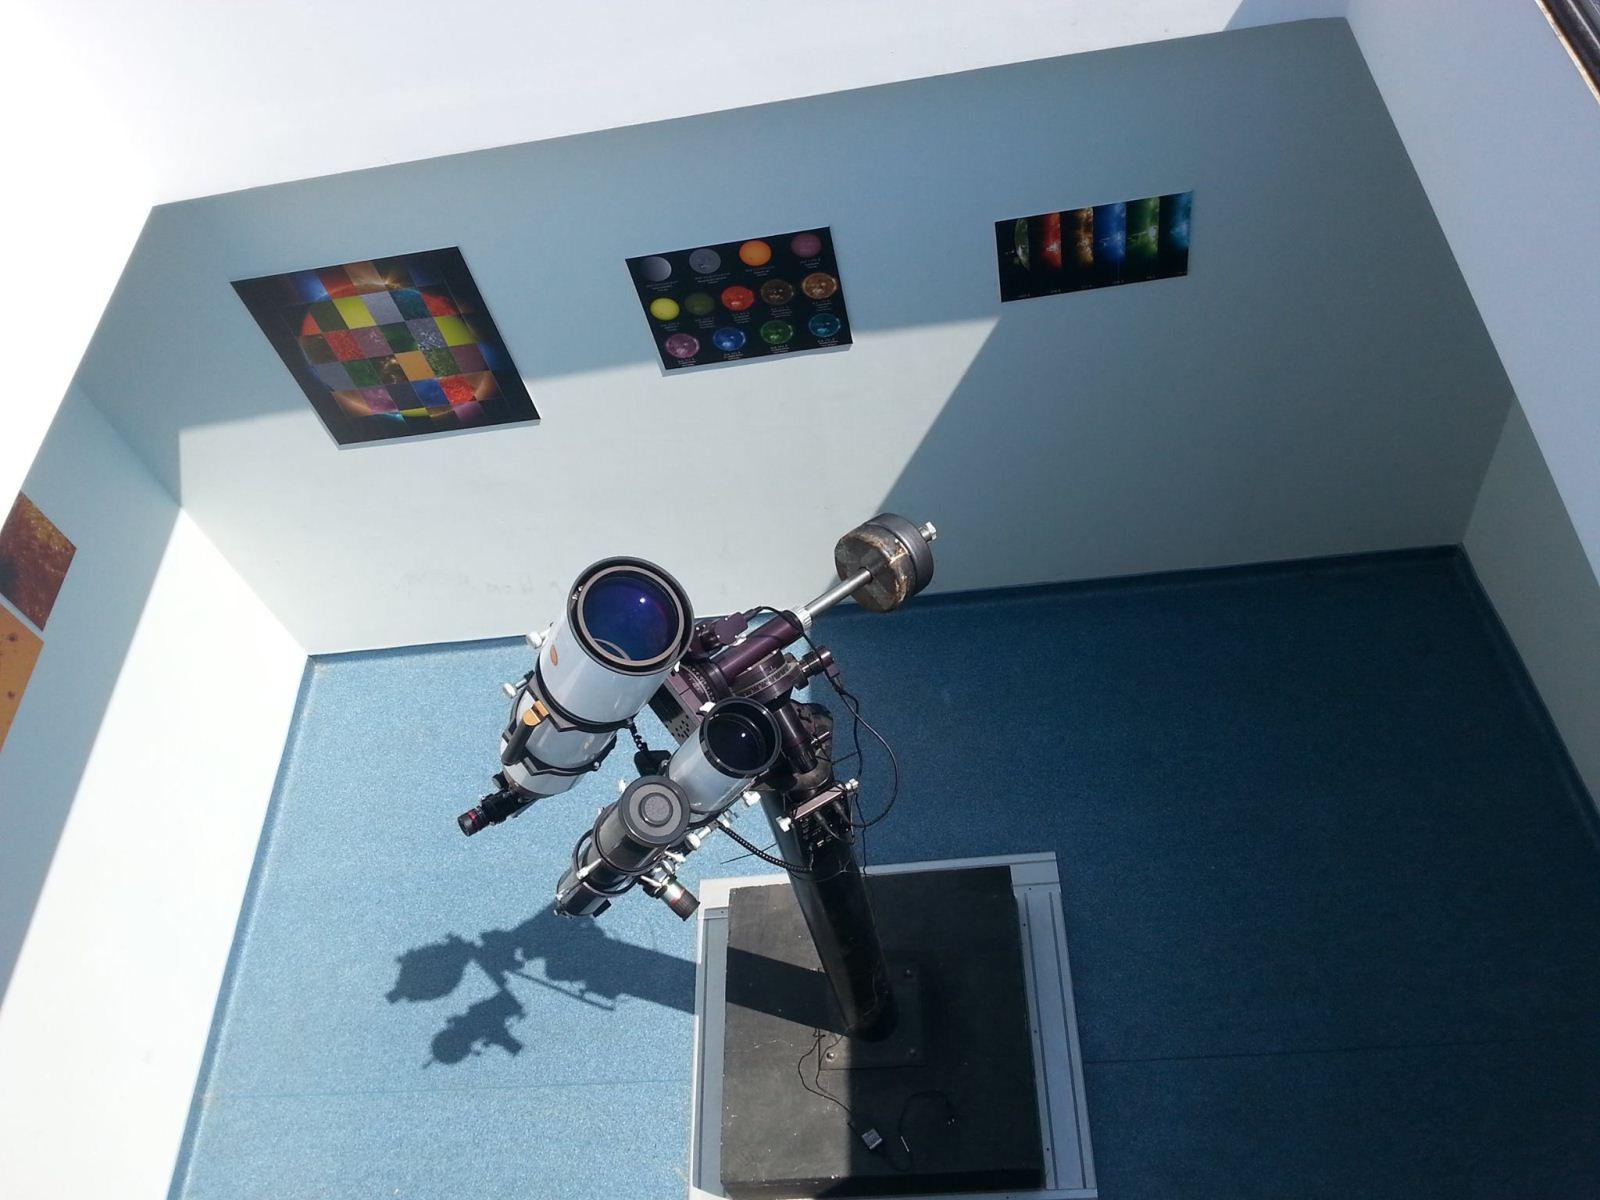 En büyük radyo teleskop kurious